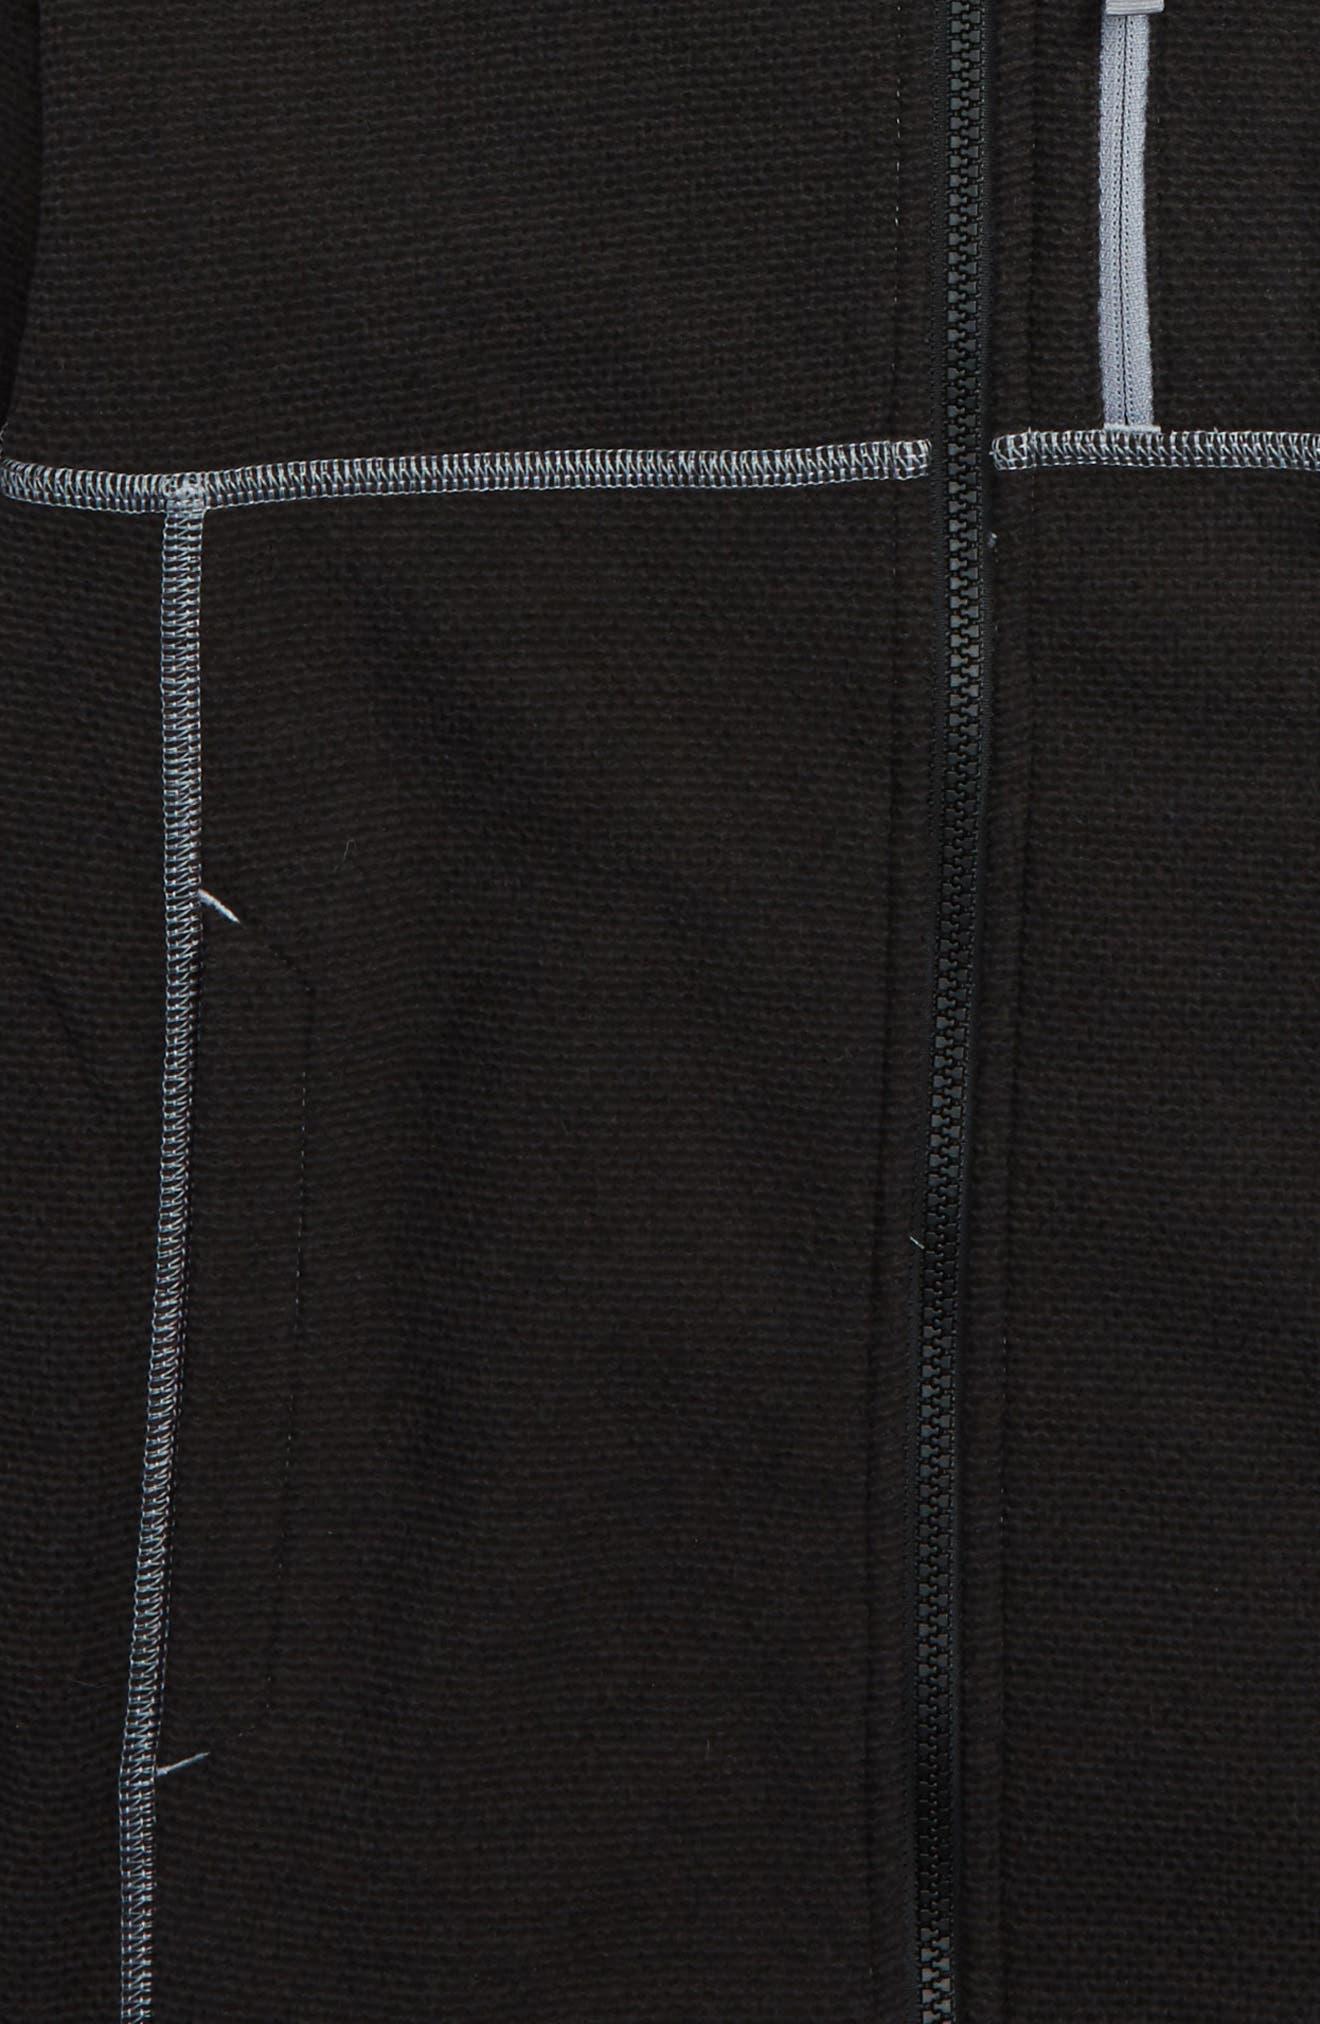 Alternate Image 2  - The North Face Cap Rock Fleece Jacket (Big Boys)